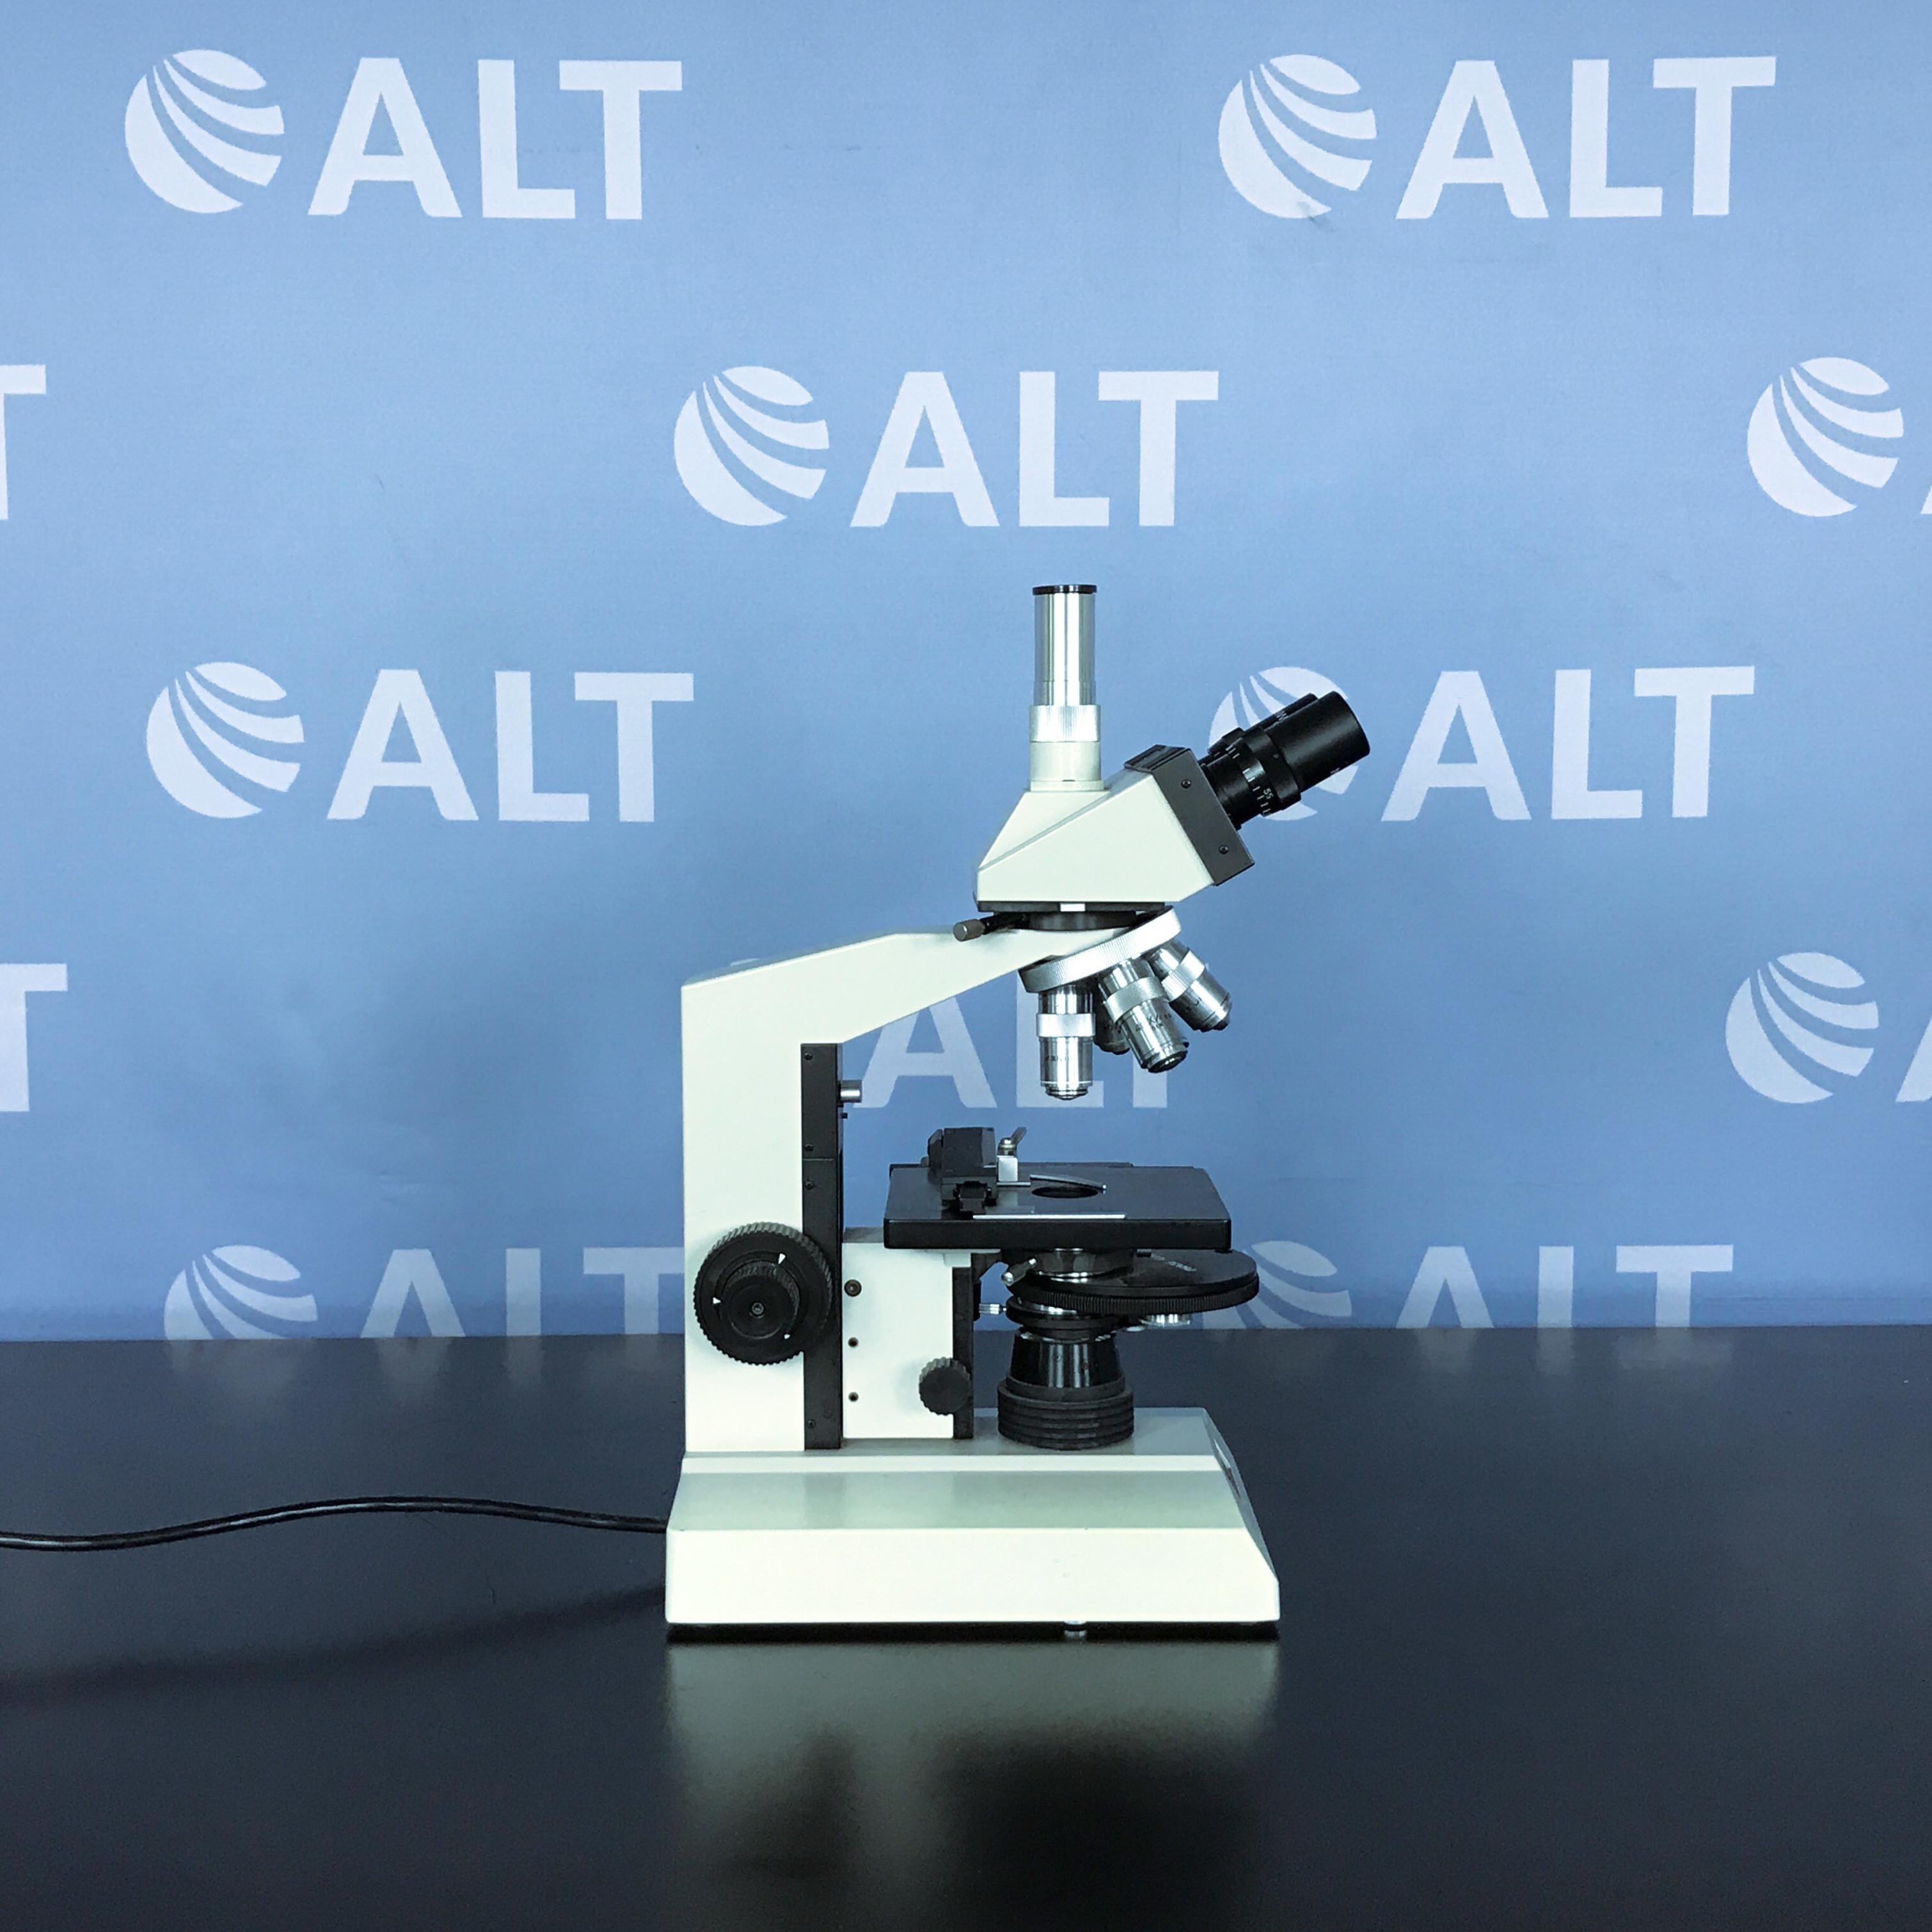 Meiji Model # 13168 Microscope Image